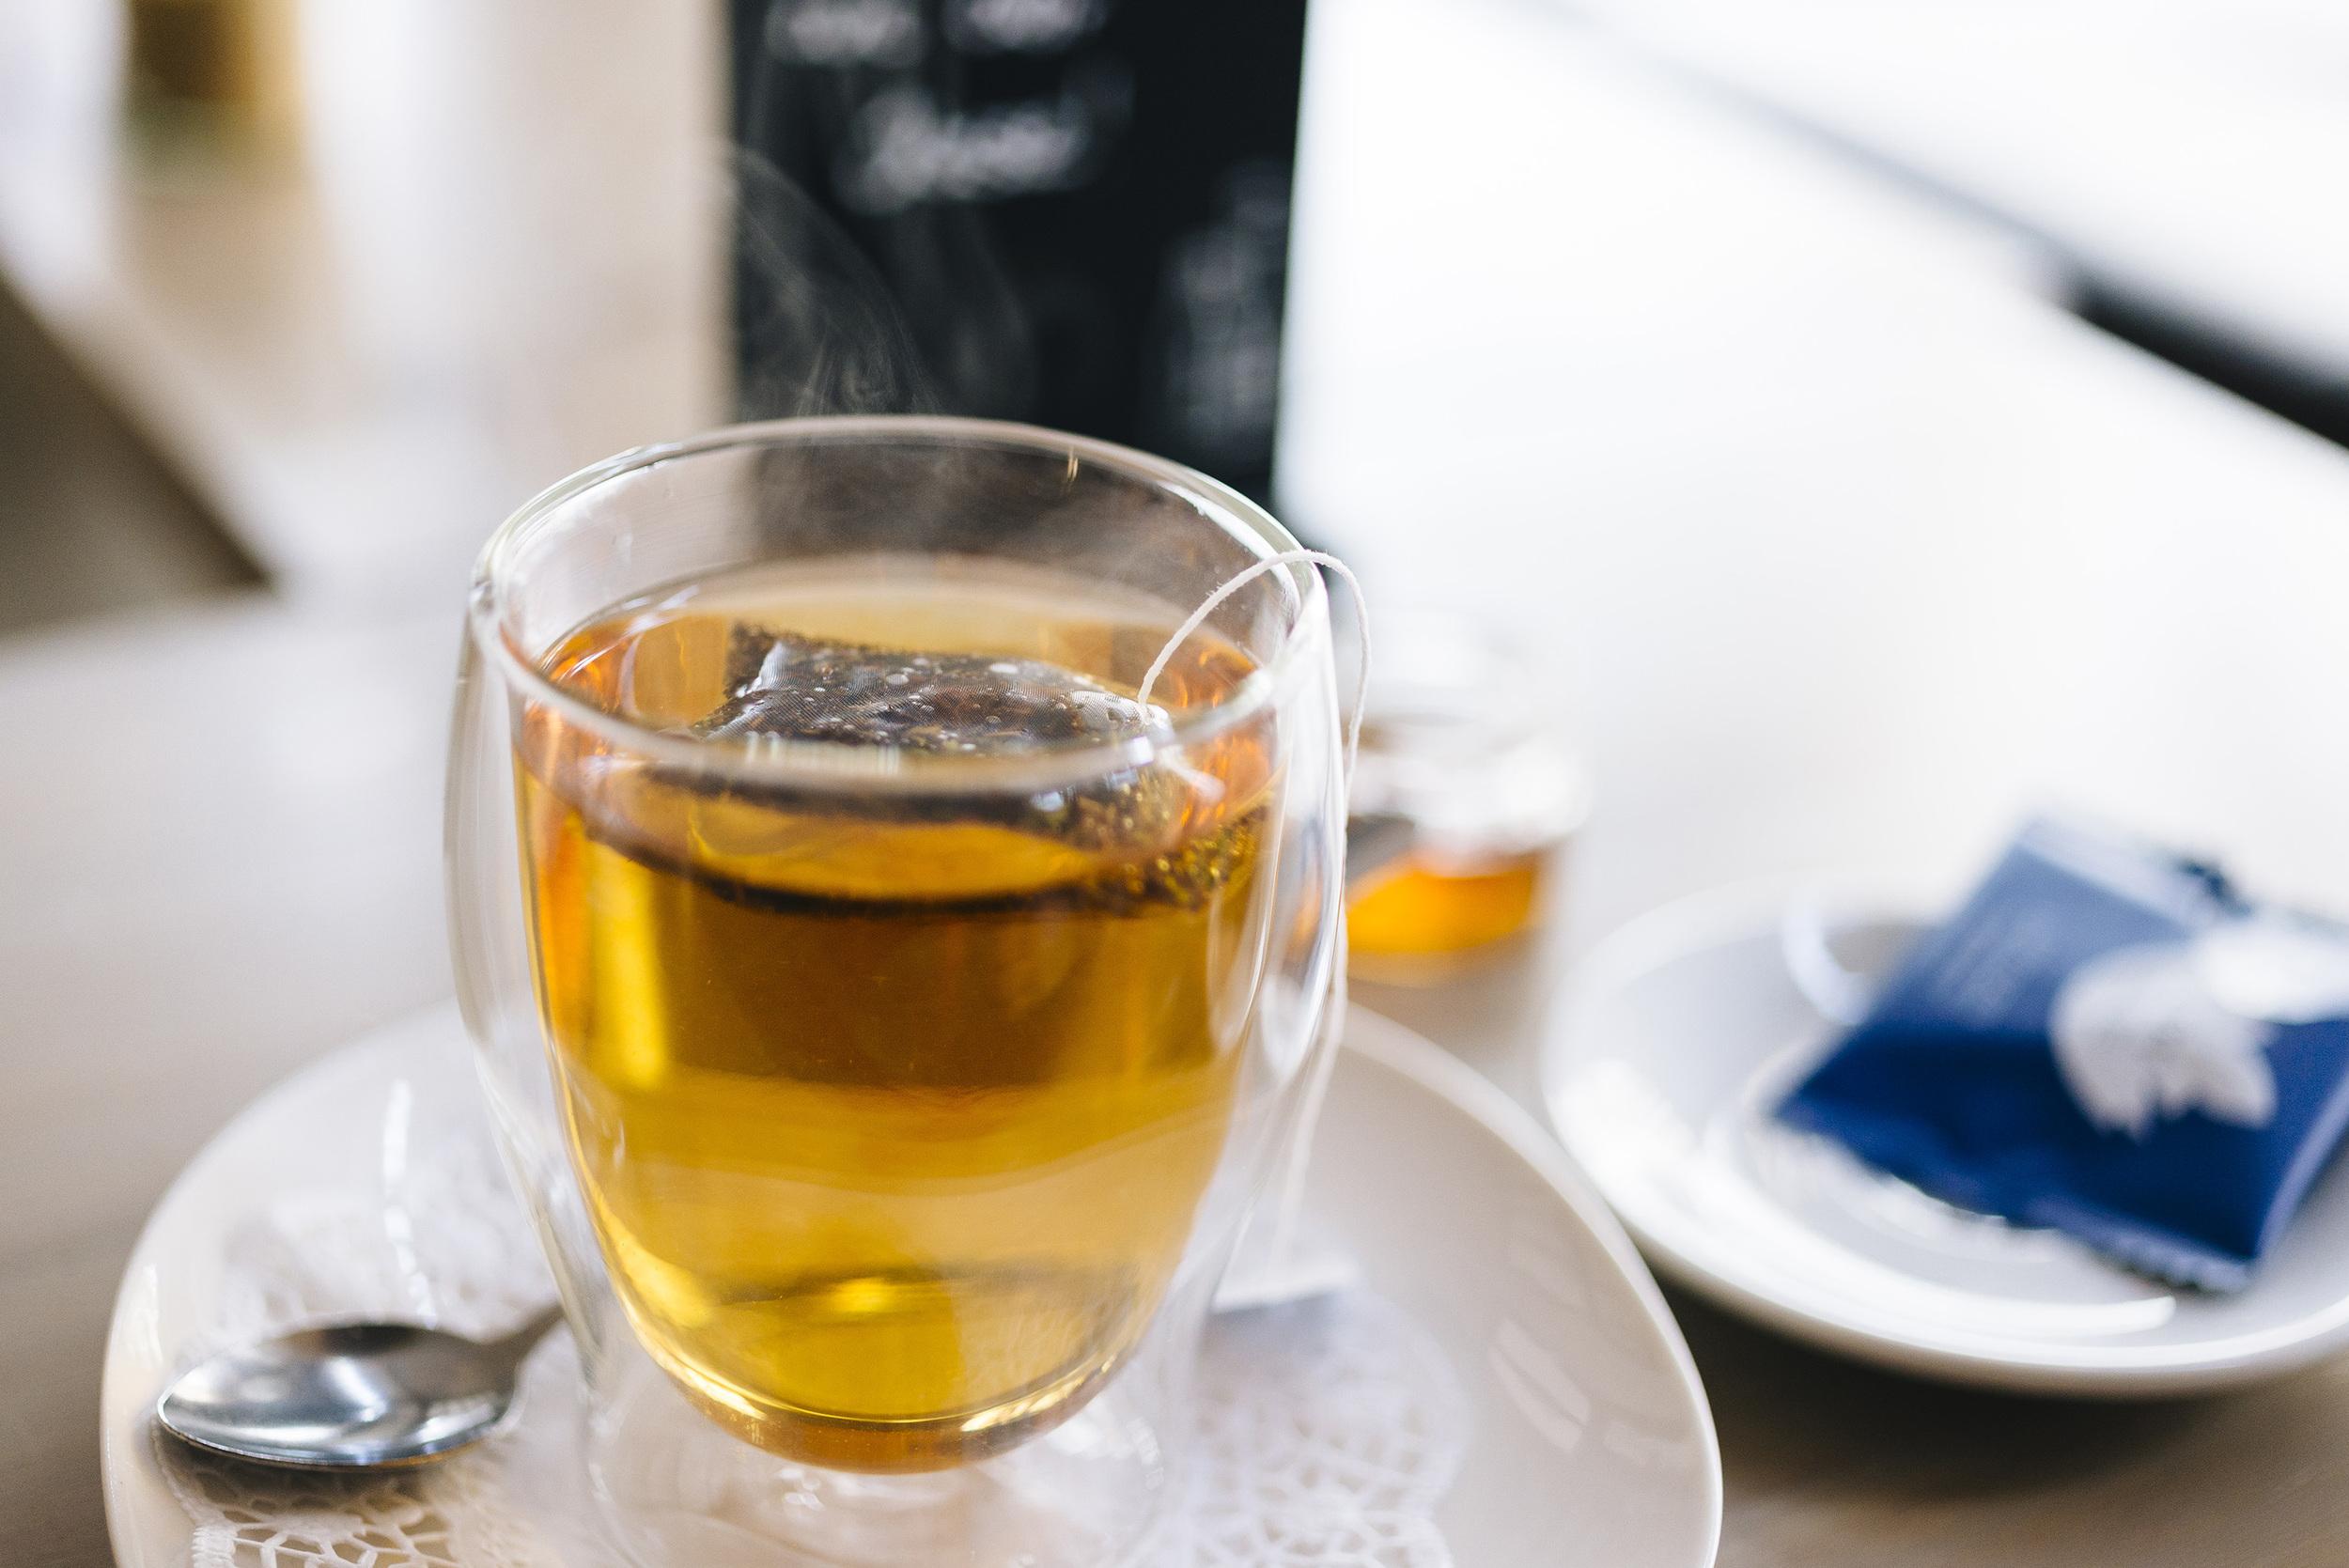 sweet-coffee-pirates-rüttenscheid-essen-pottspott-10.jpg